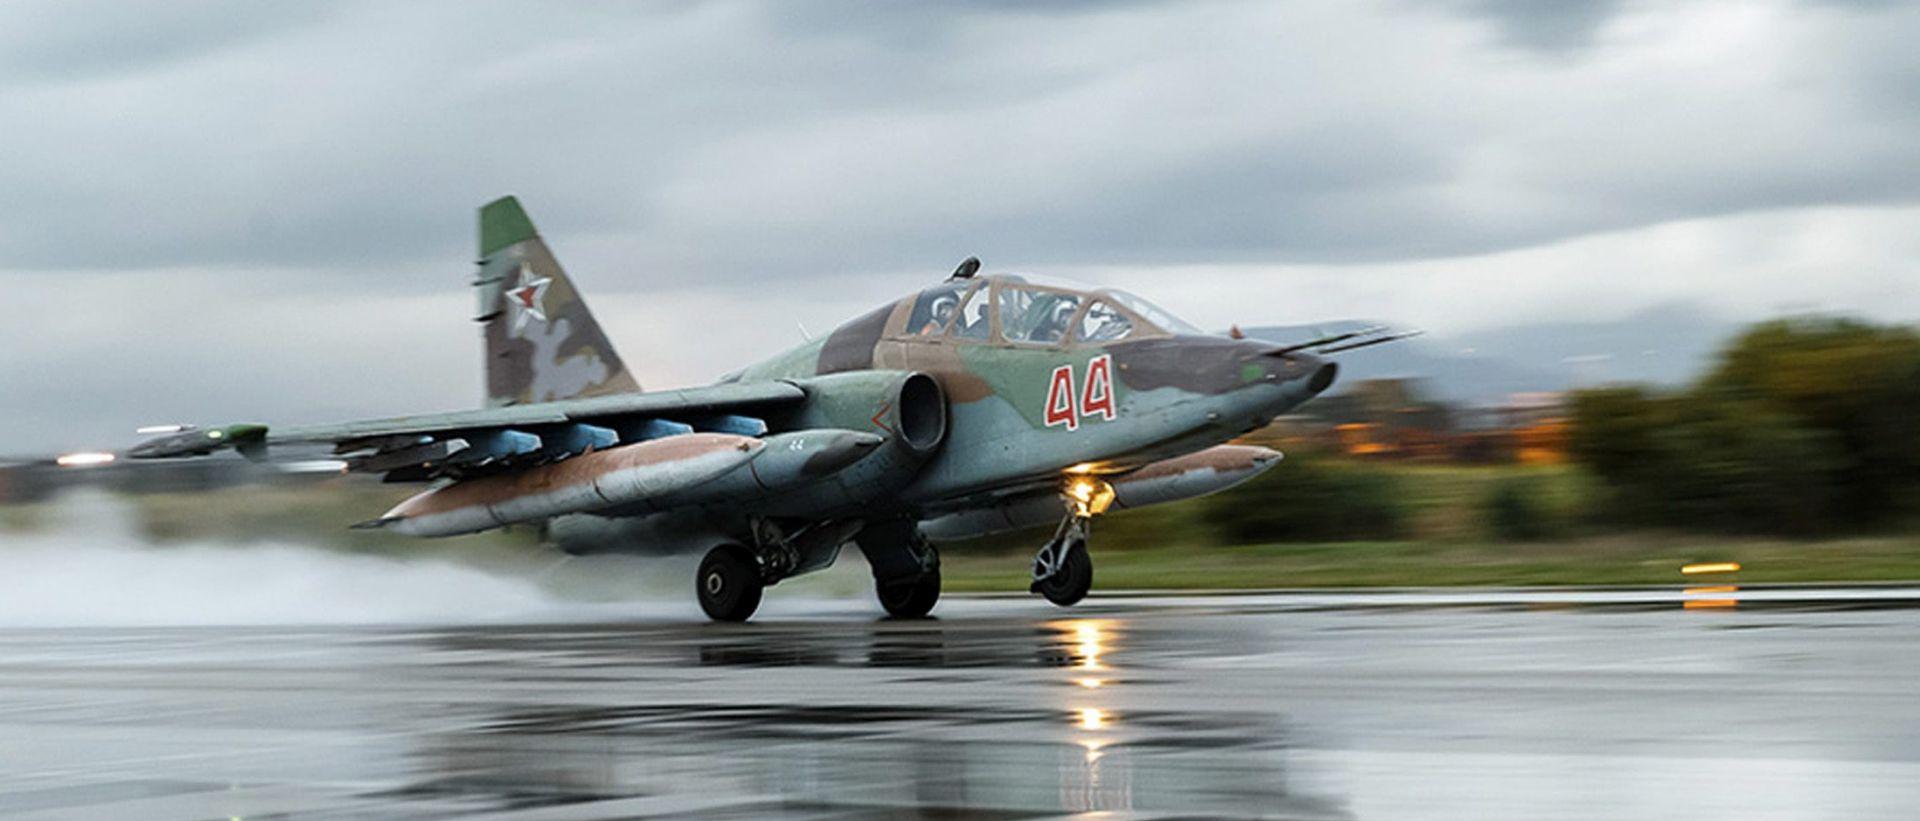 UOČI PRIMIRJA: Rusija povukla 30 zrakoplova iz Sirije, zatišje ugrožava Al Nusra